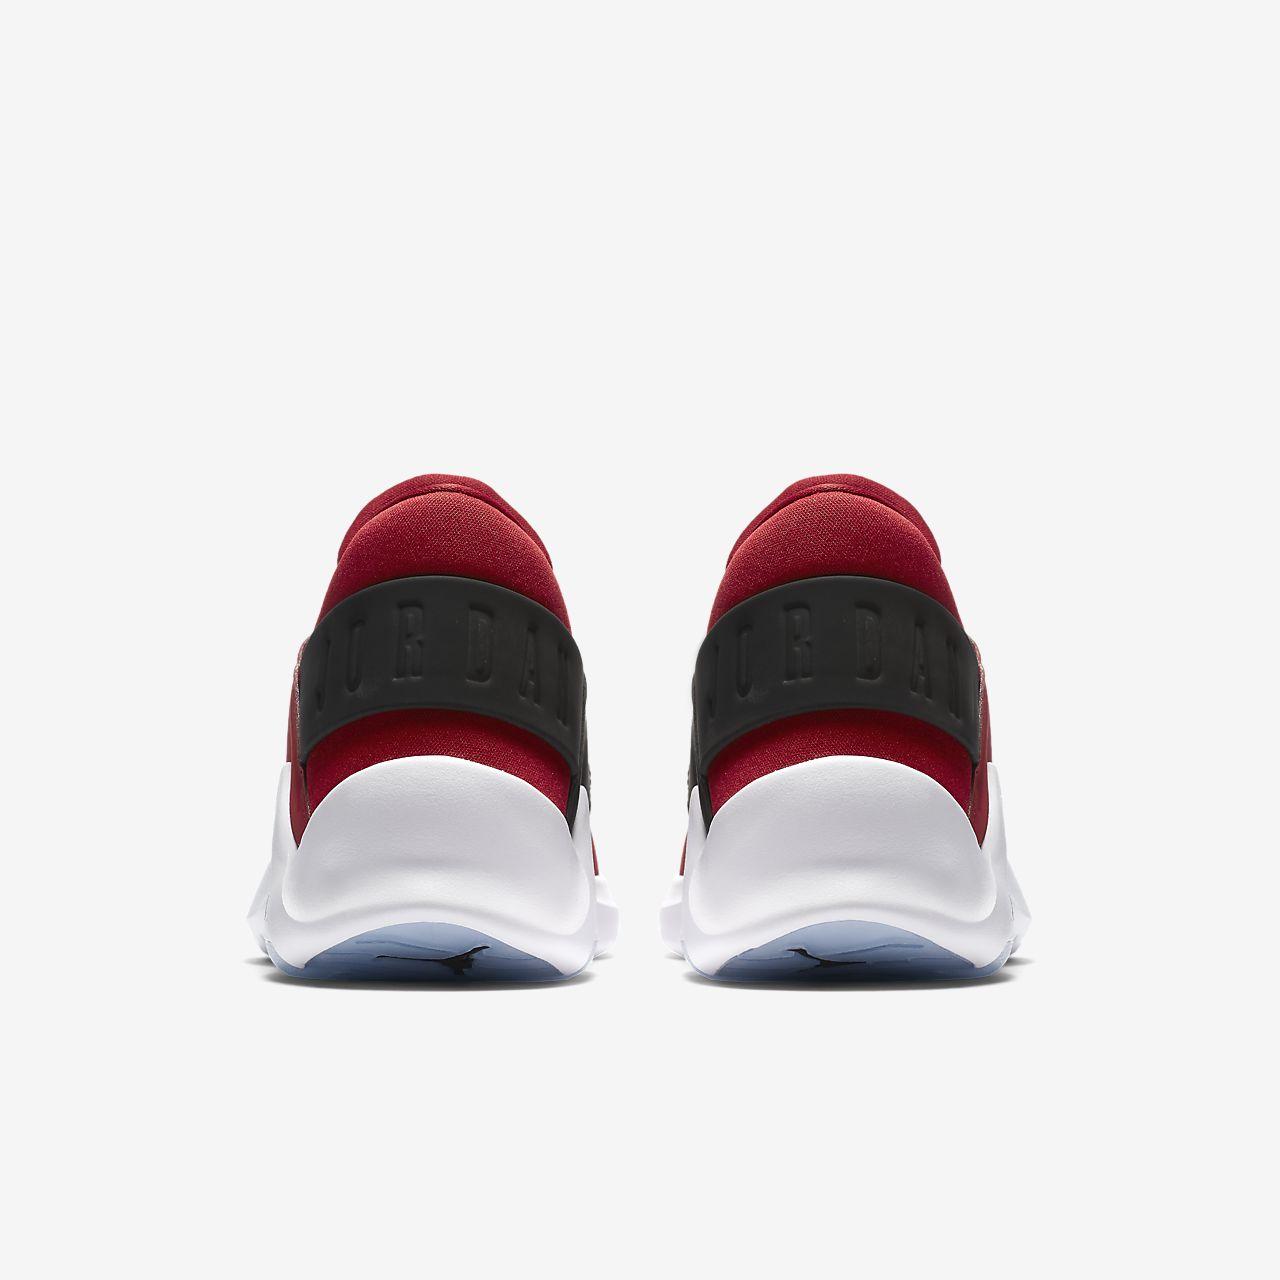 Nike Jordan Red Shoes